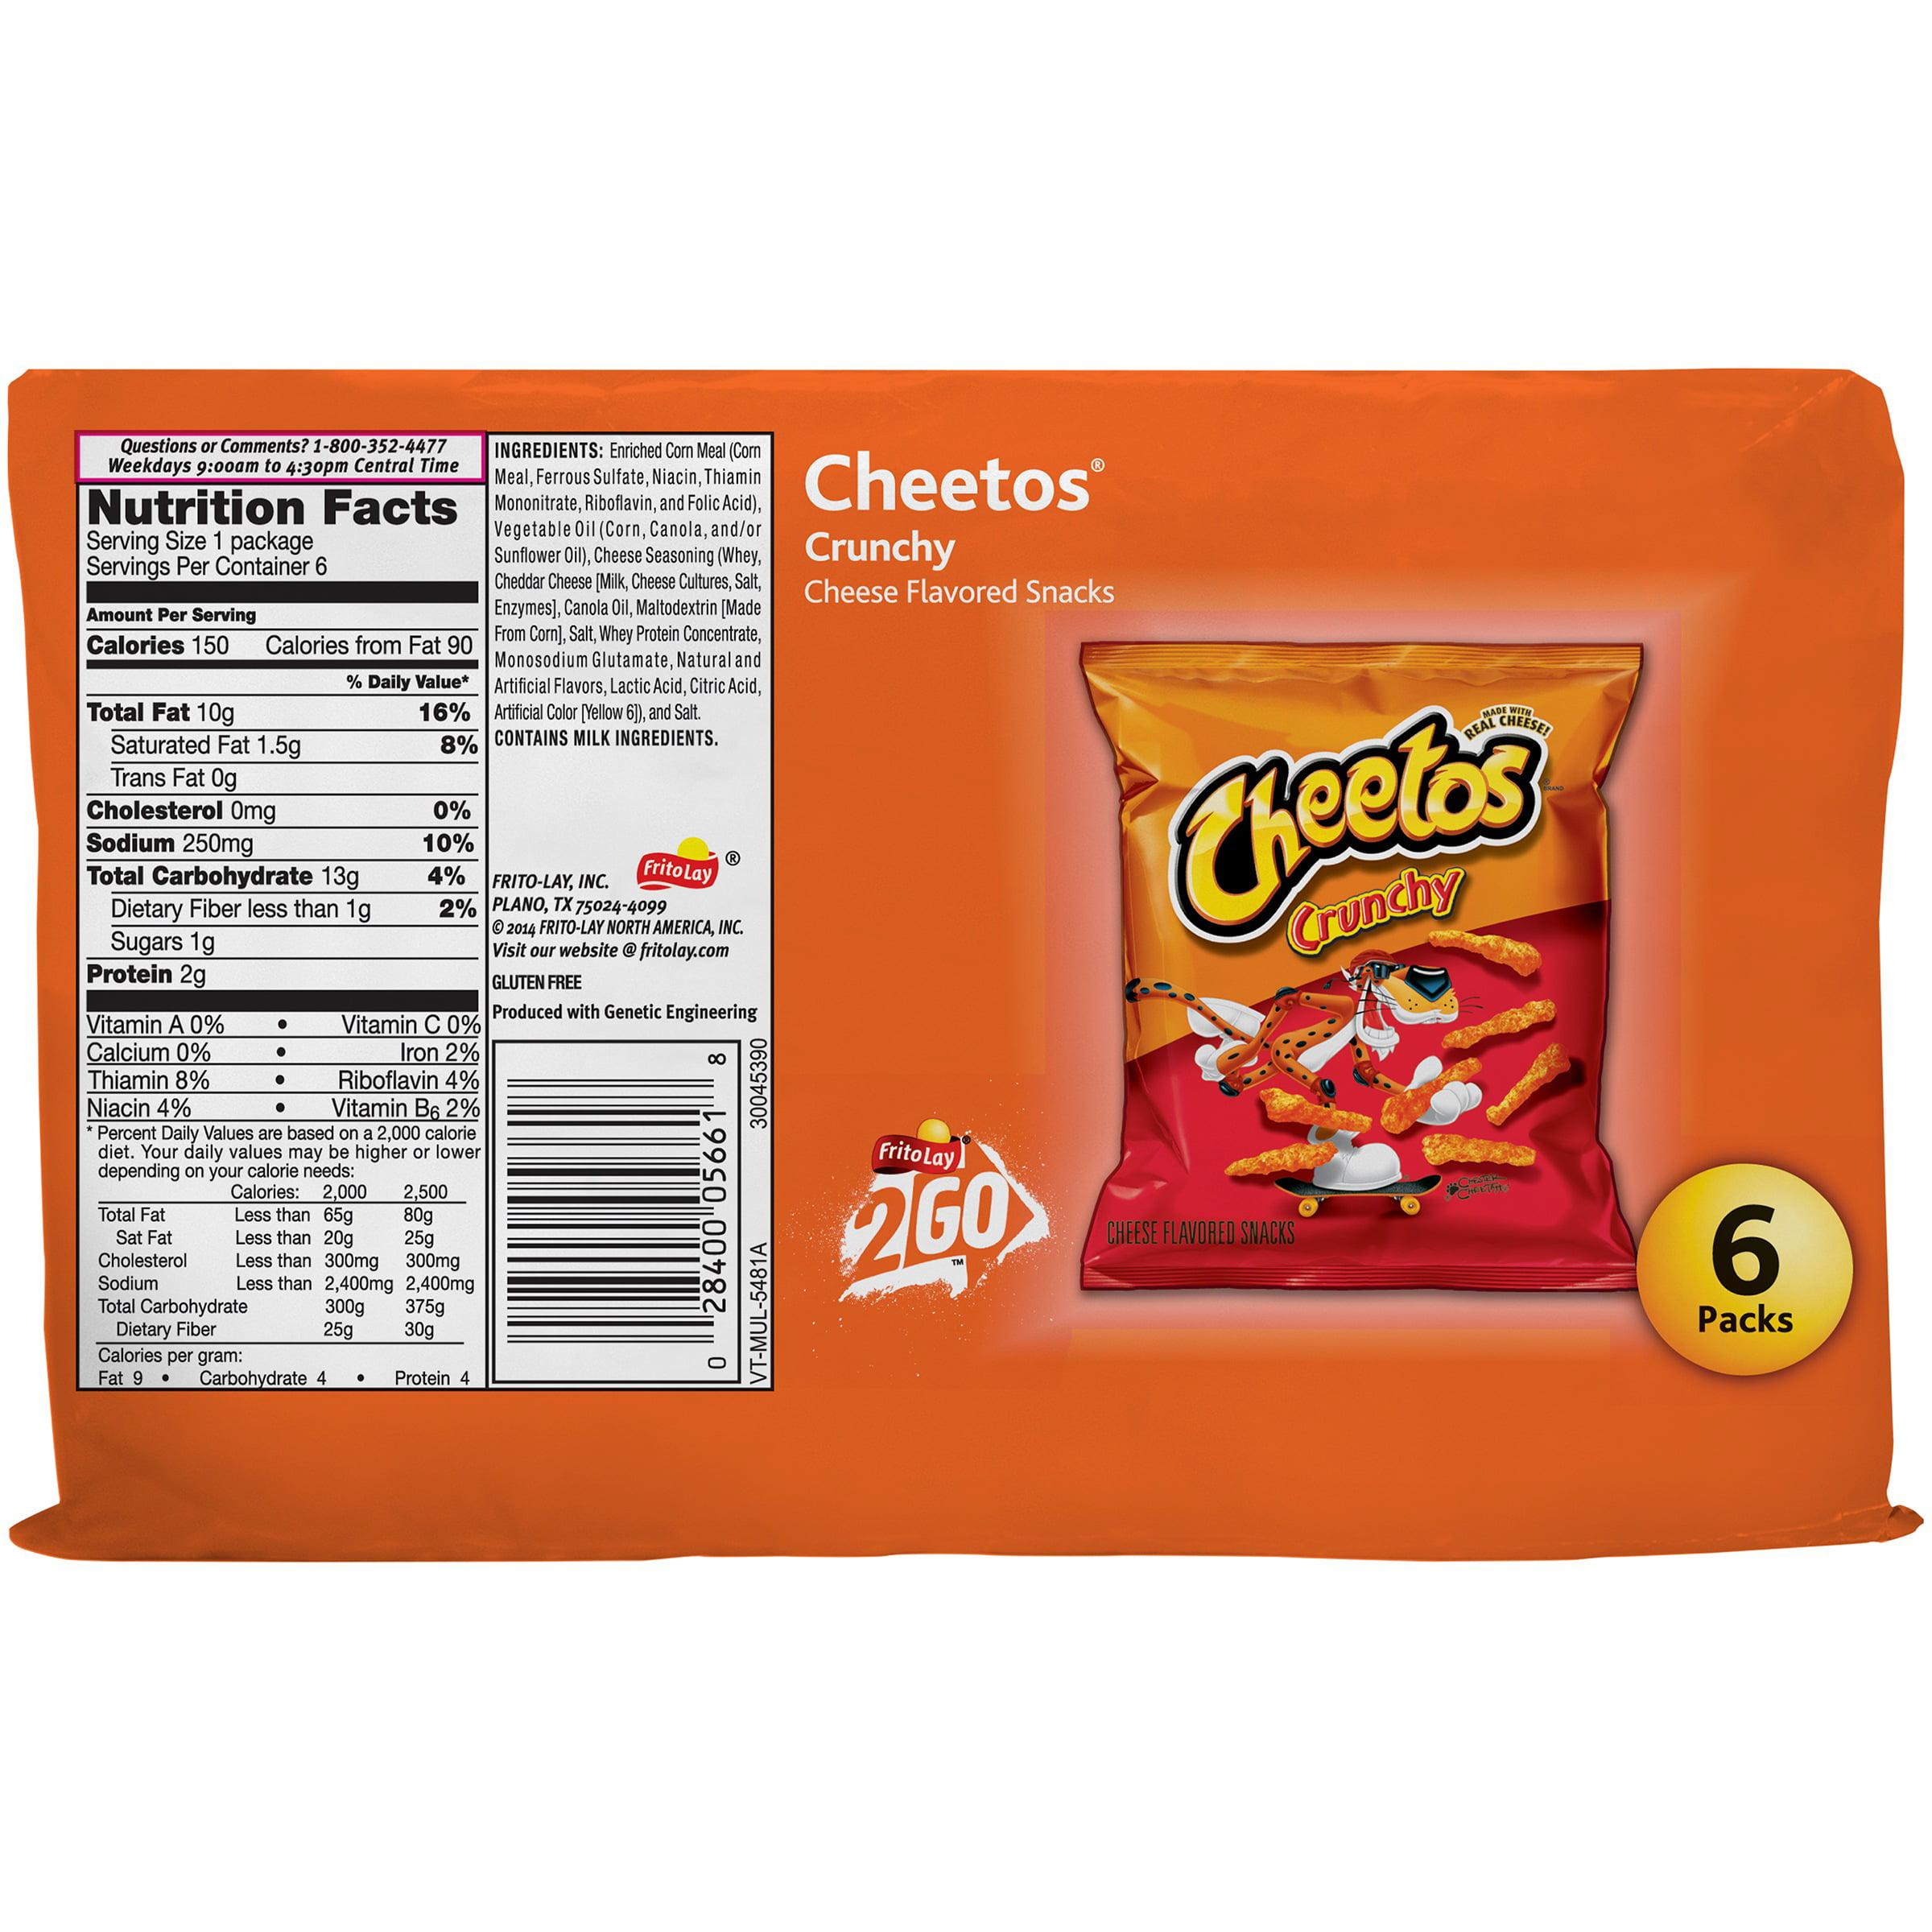 cheetos crunchy cheese flavored snacks 6-1 oz. bags - walmart